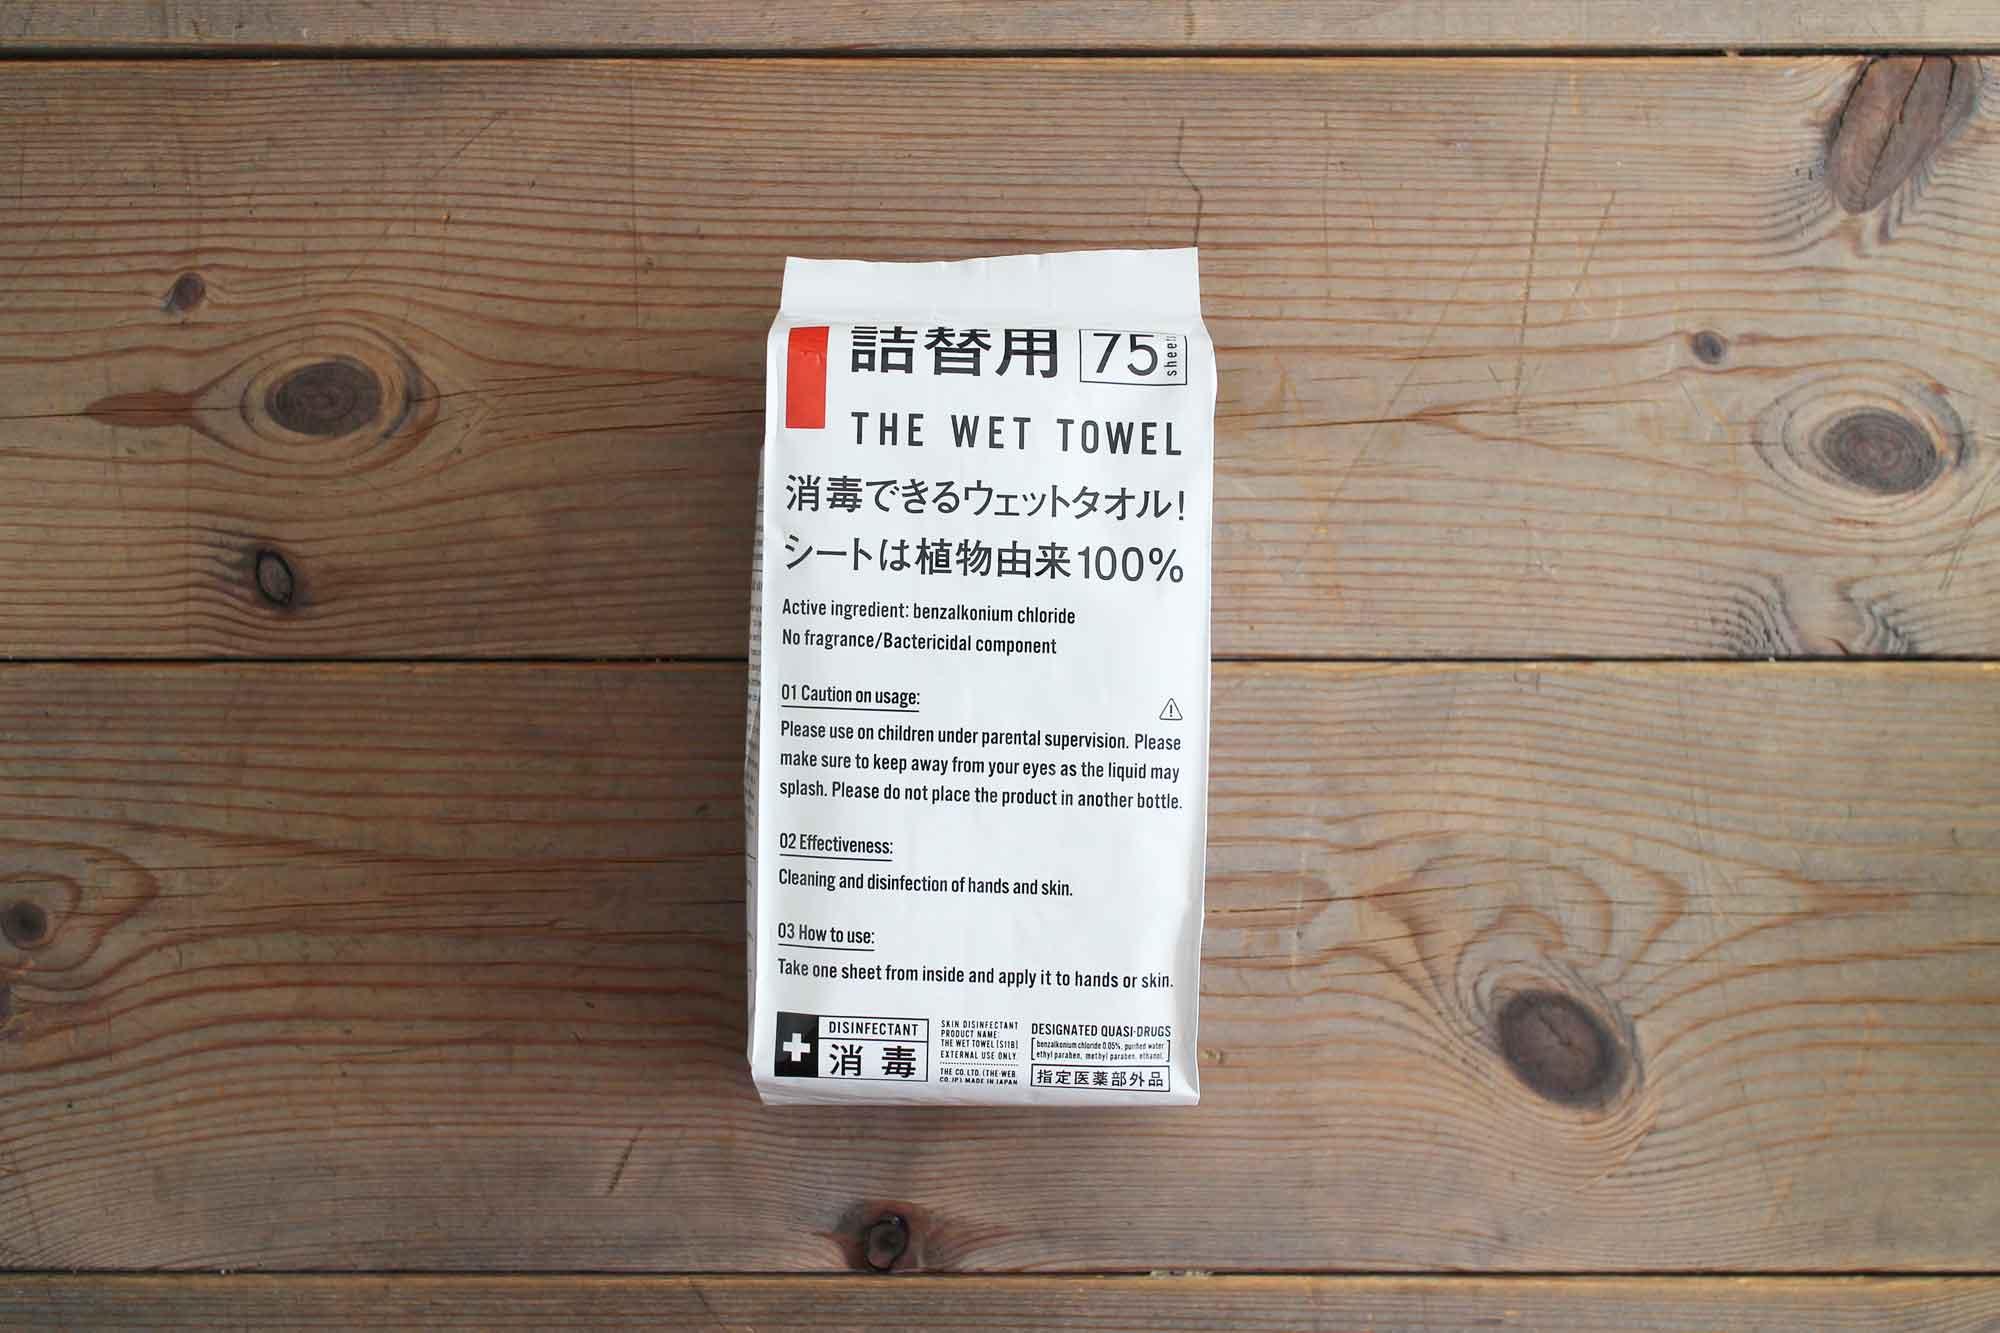 THE WET TOWEL 消毒 ウェットタオル